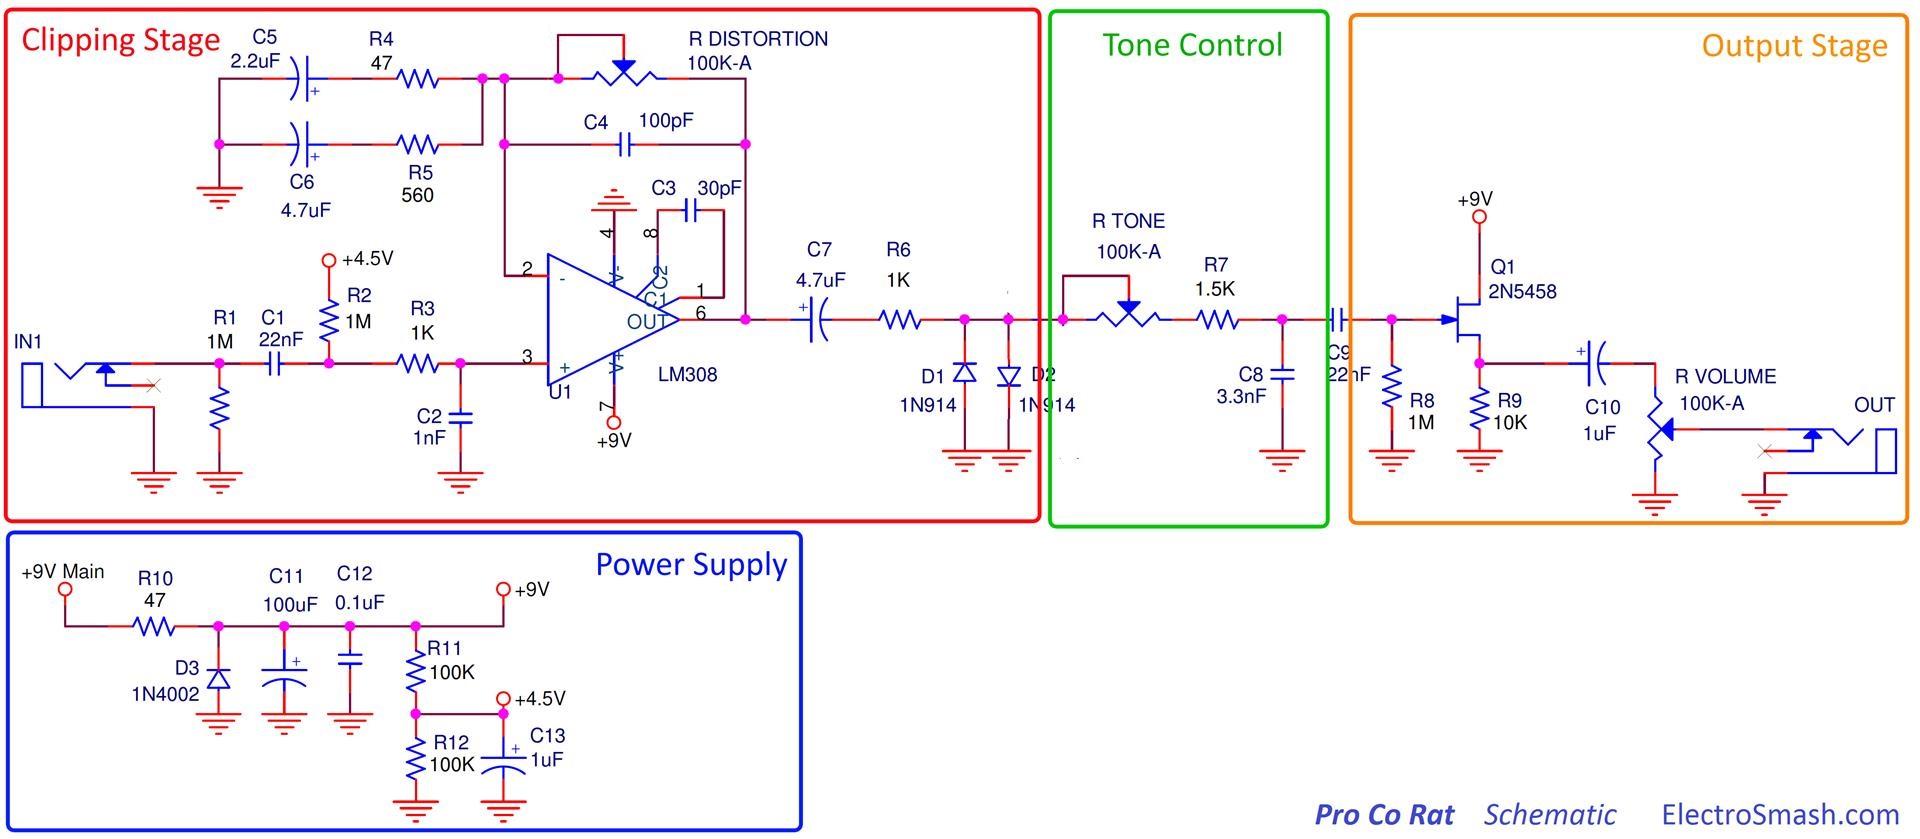 proco rat schematic